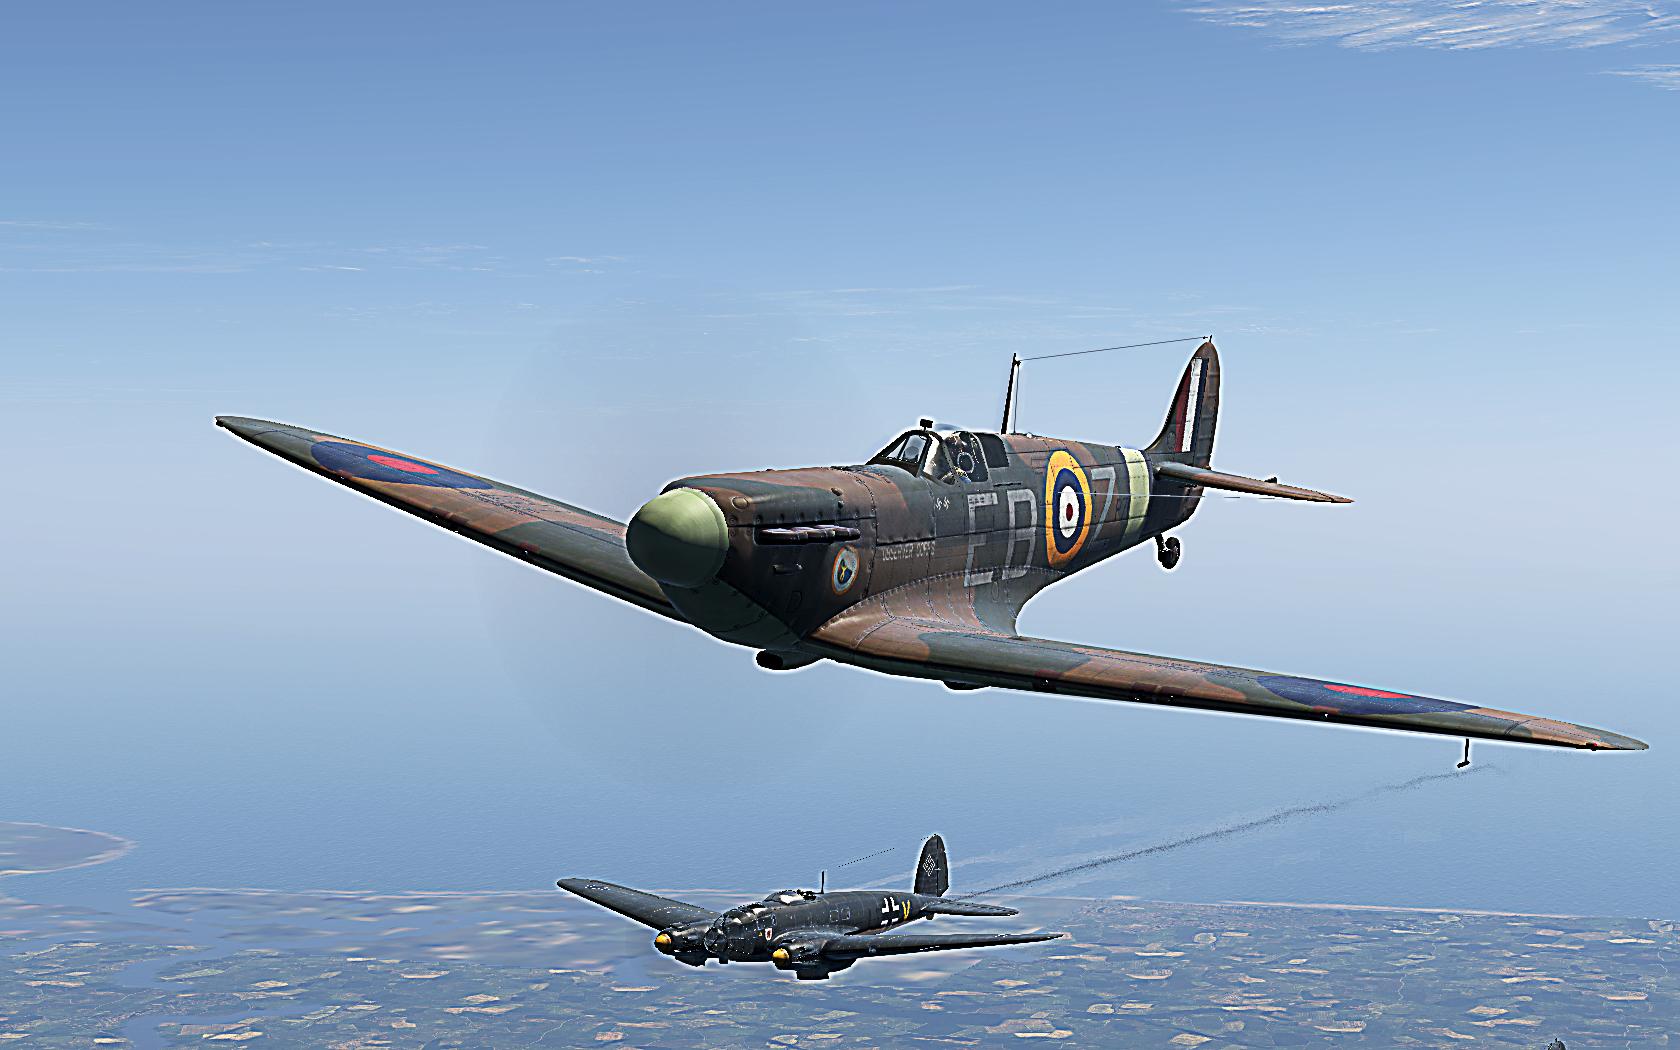 COD KF MkIIa RAF 41Sqn EBZ Jack Stokoe P7666 England 1941 V01